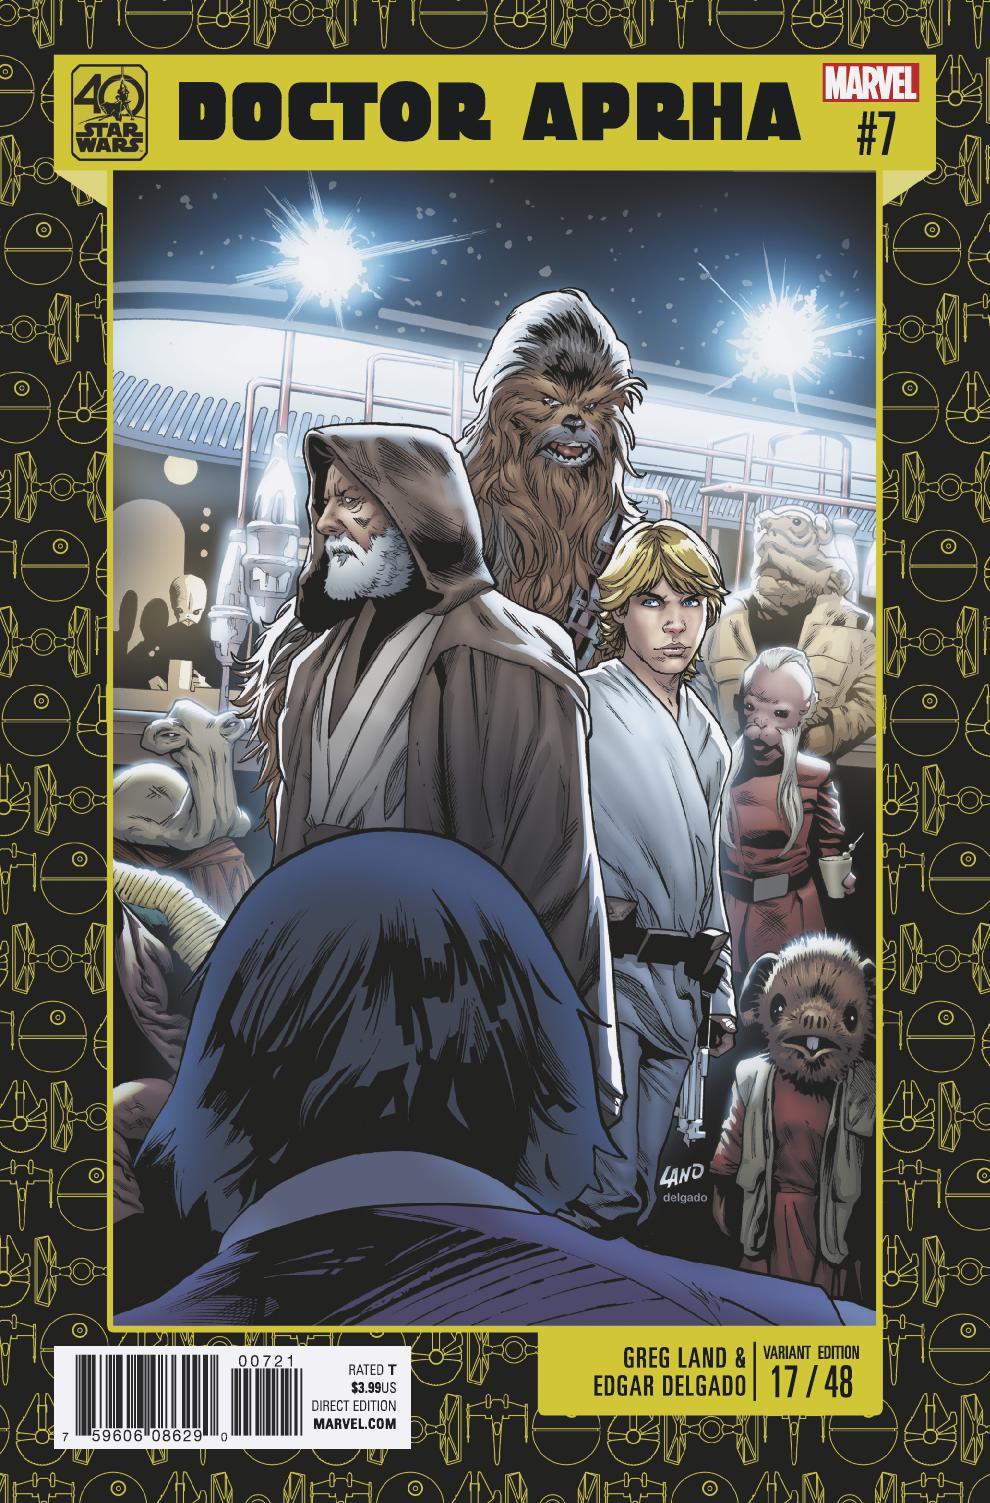 Doctor Aphra 7 Star Wars 40th Anniversary.jpg